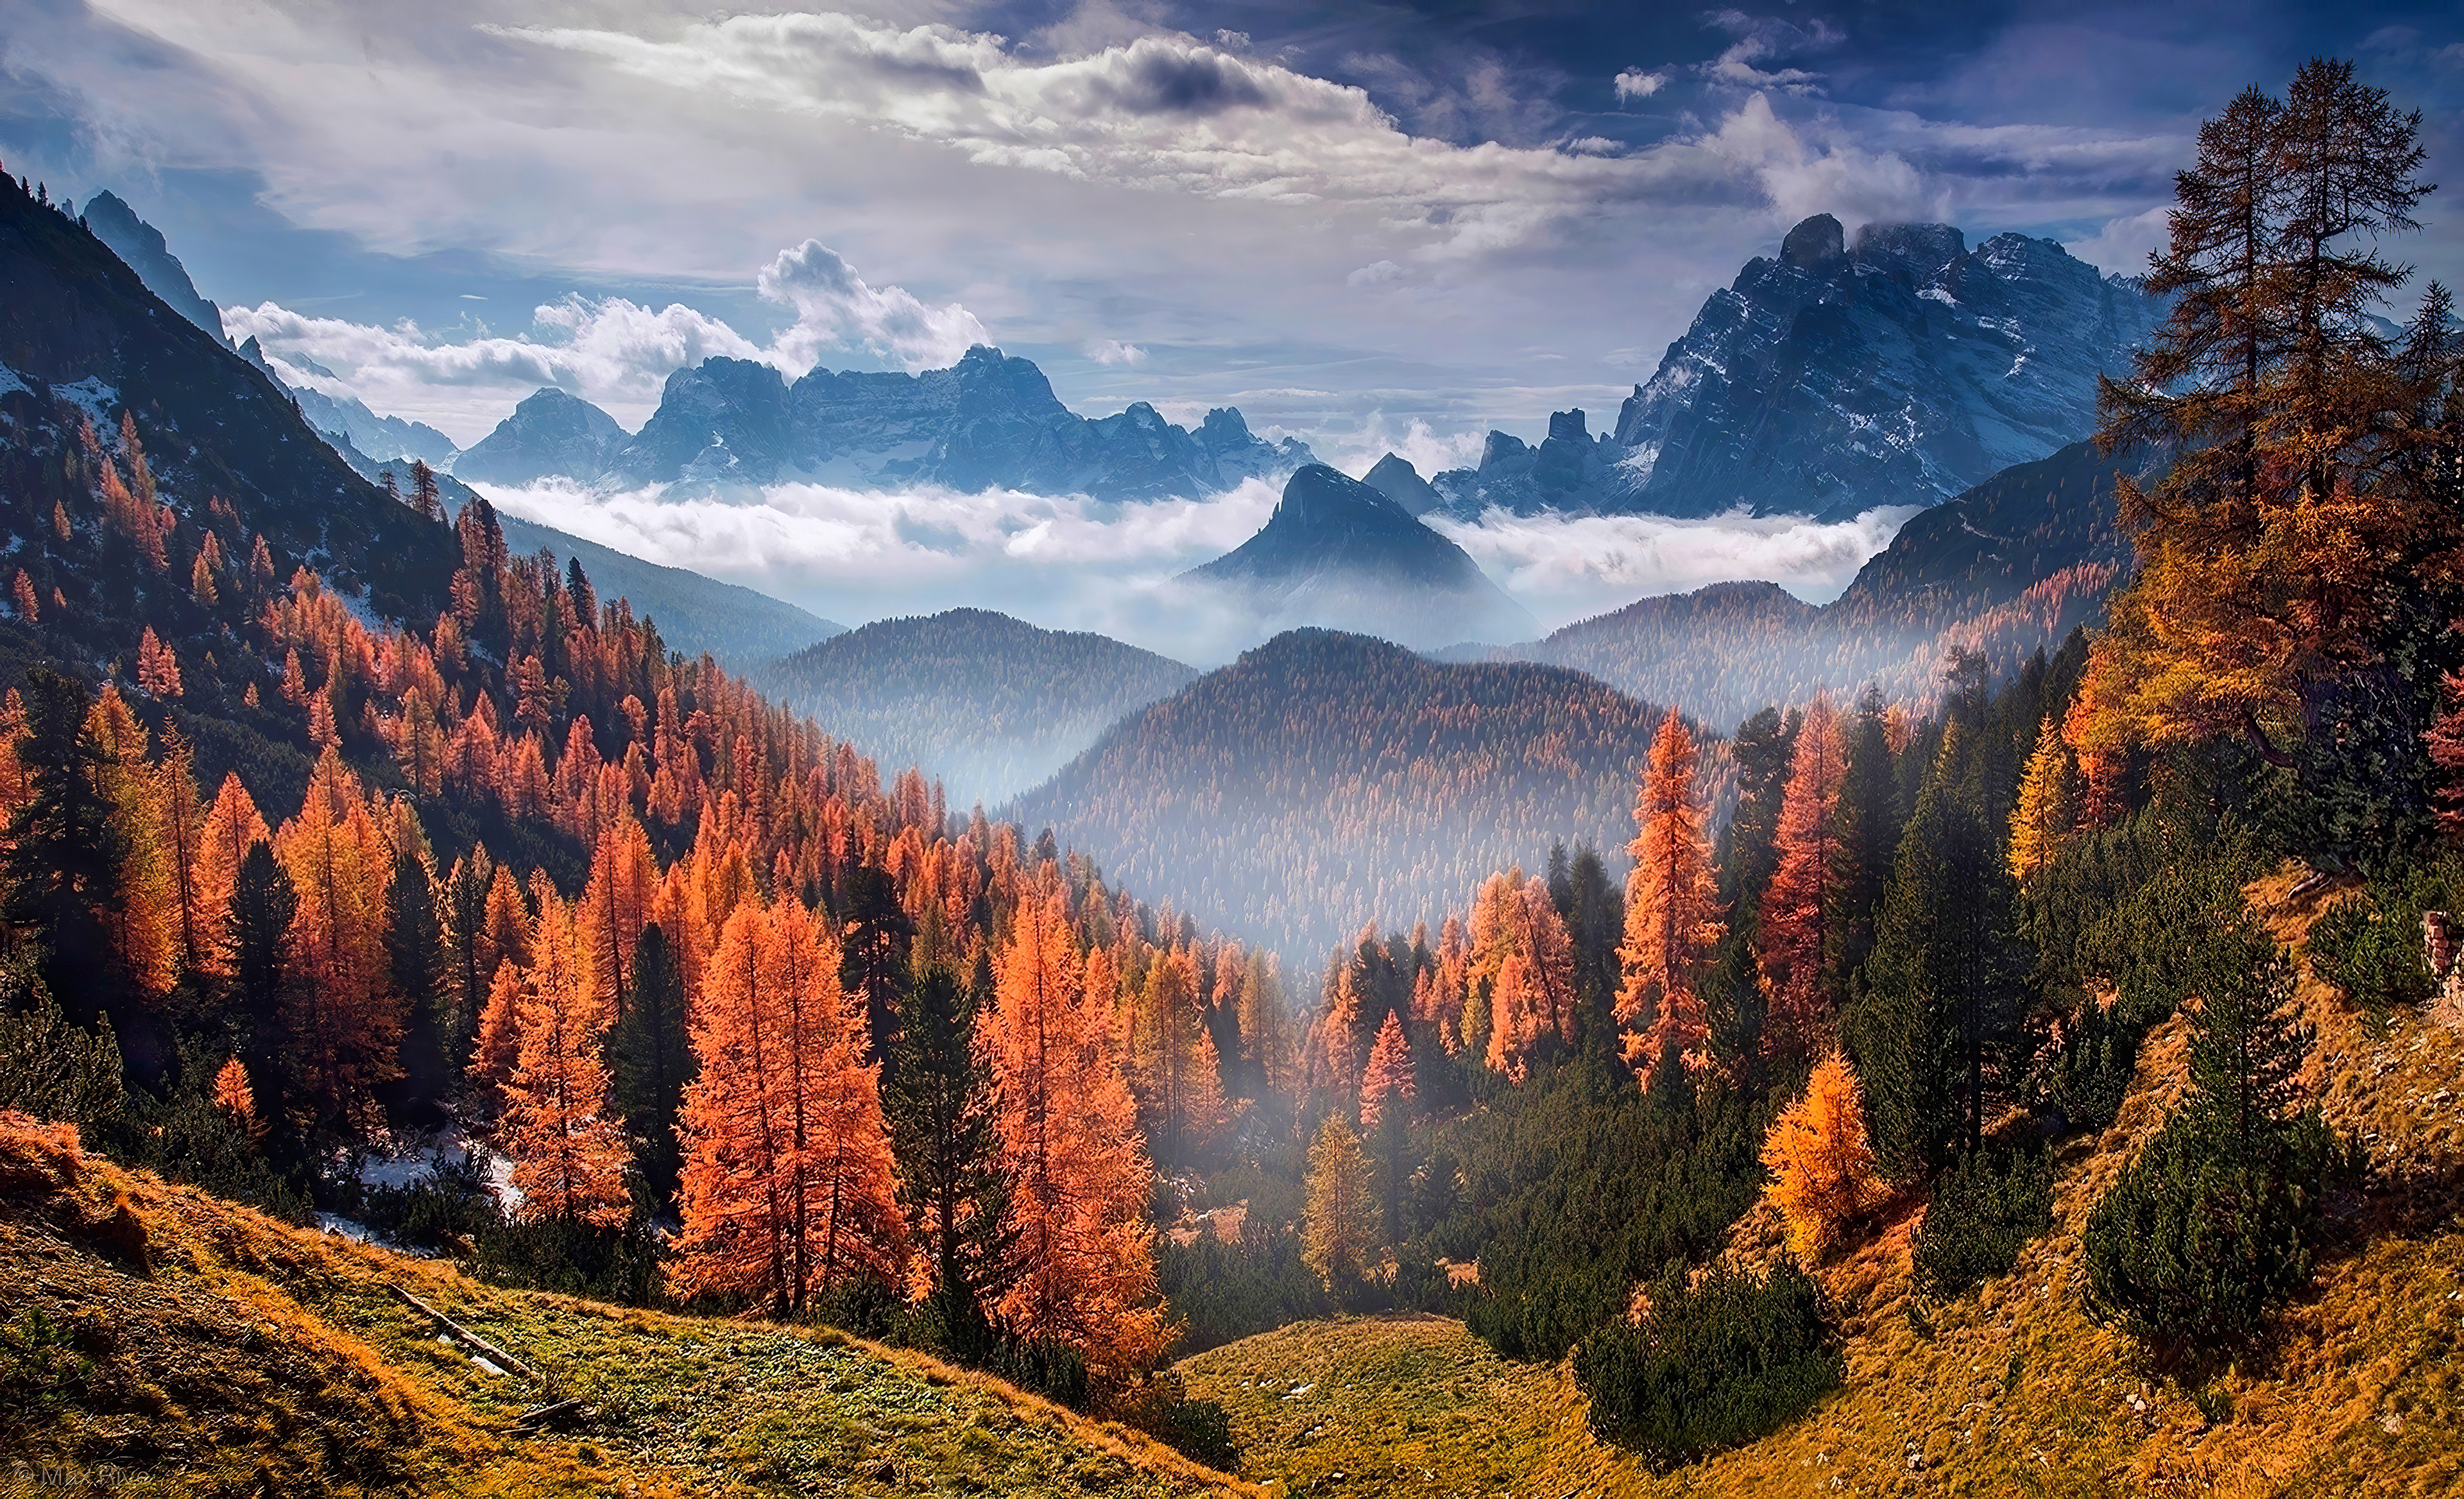 forest landscape clouds 1574937767 - Forest Landscape Clouds -